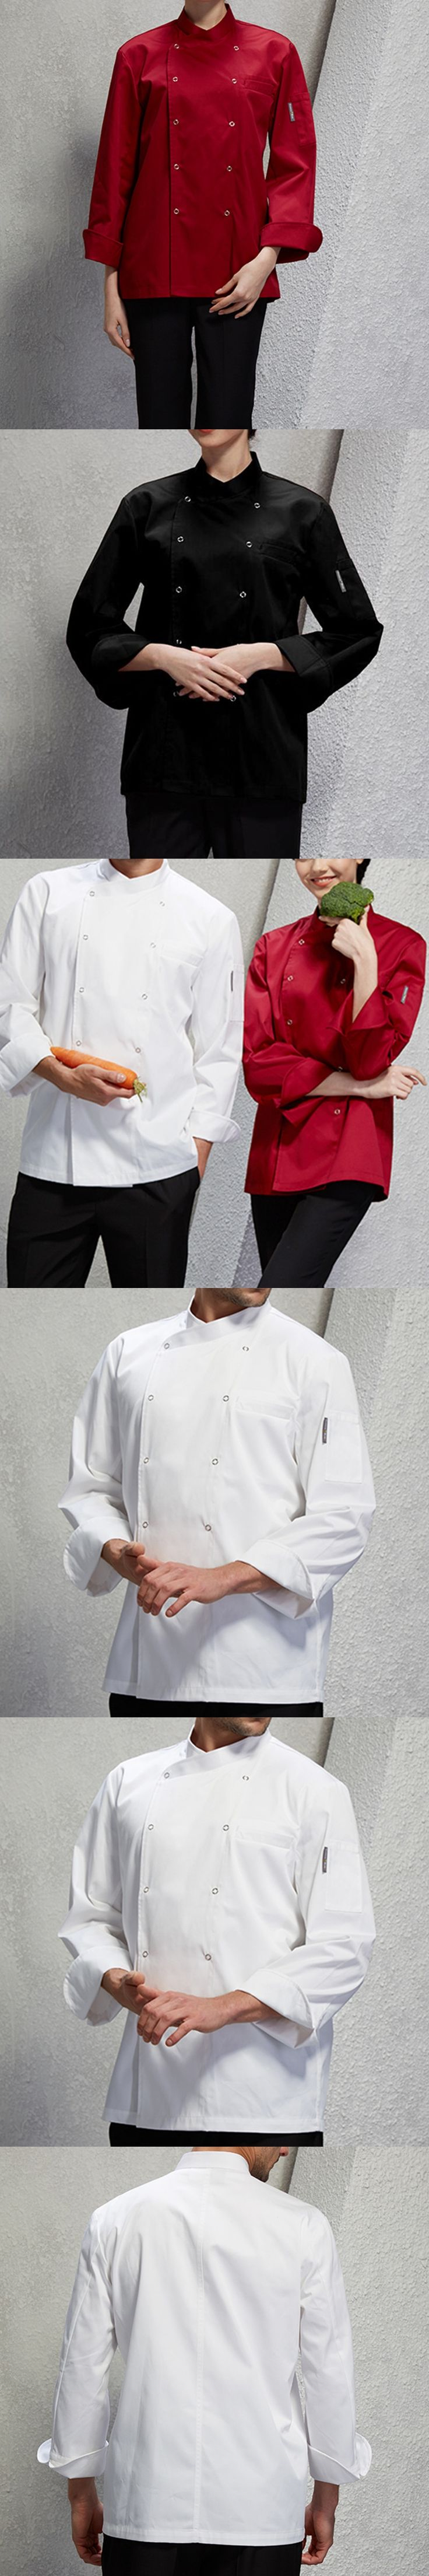 White Red Black Long Sleeve Shirt Barista Hotel Restaurant Diner Kitchen Chef Uniform Bistro Baker Bar Catering Work Wear D18